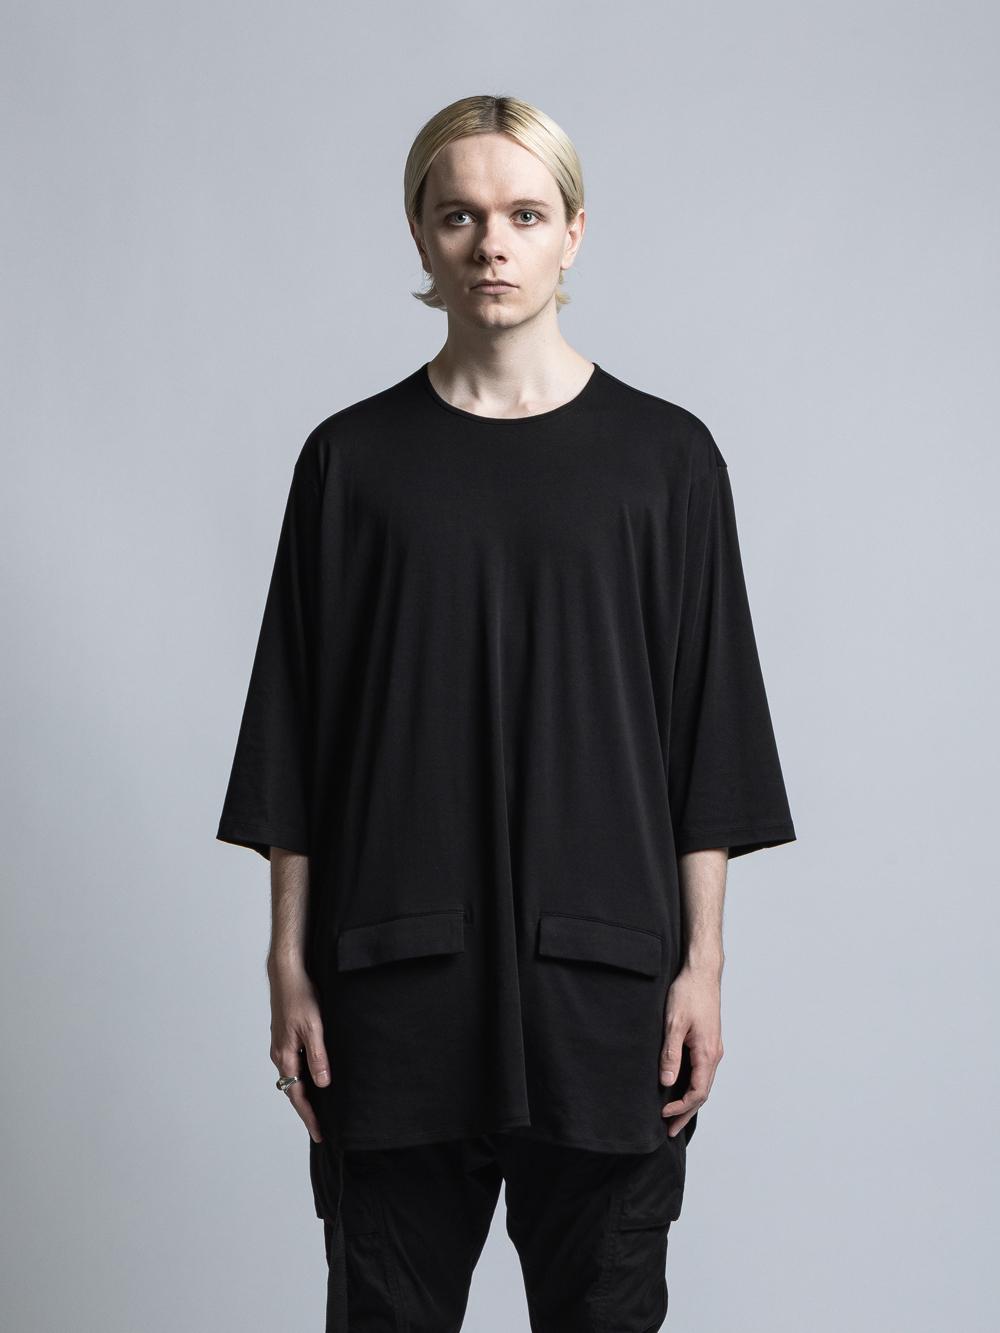 VI-3351-01 / ハイゲージスムース裾ポケット七分袖カットソー